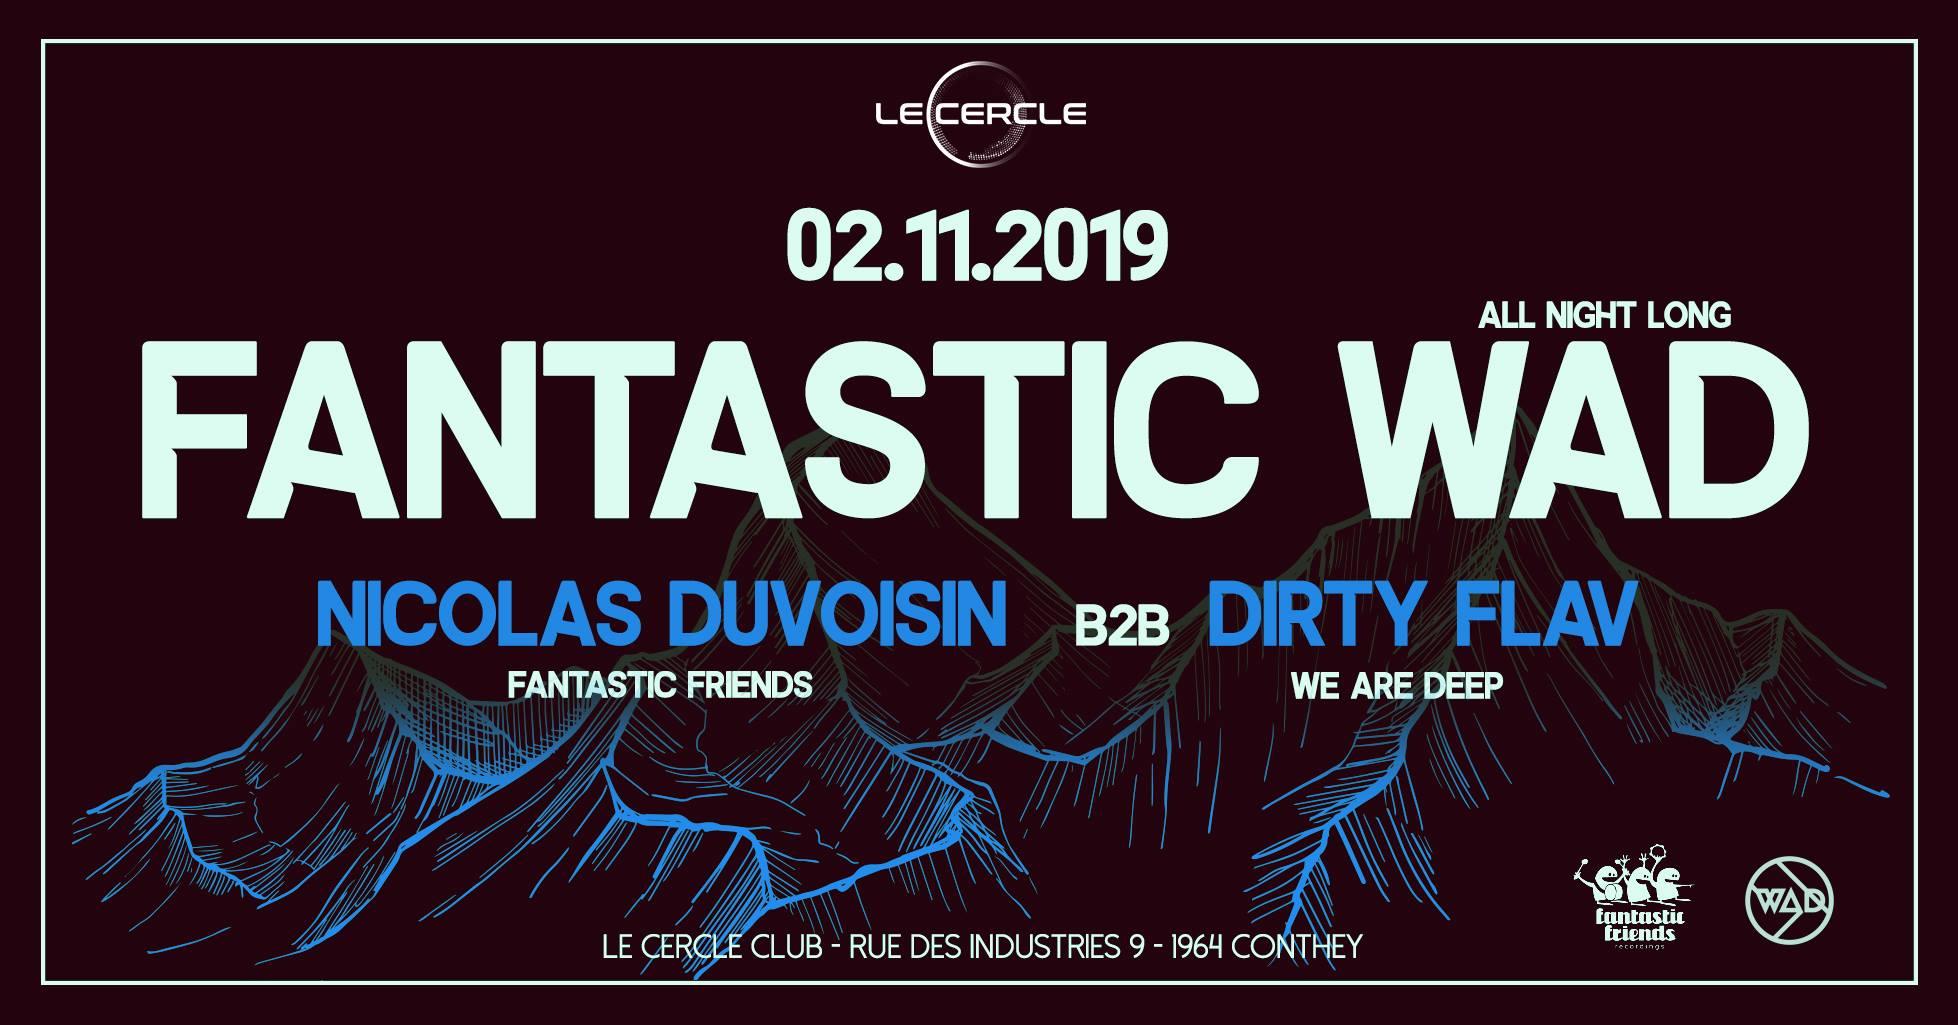 Fantastic Wad at Le Cercle - 02.11.19